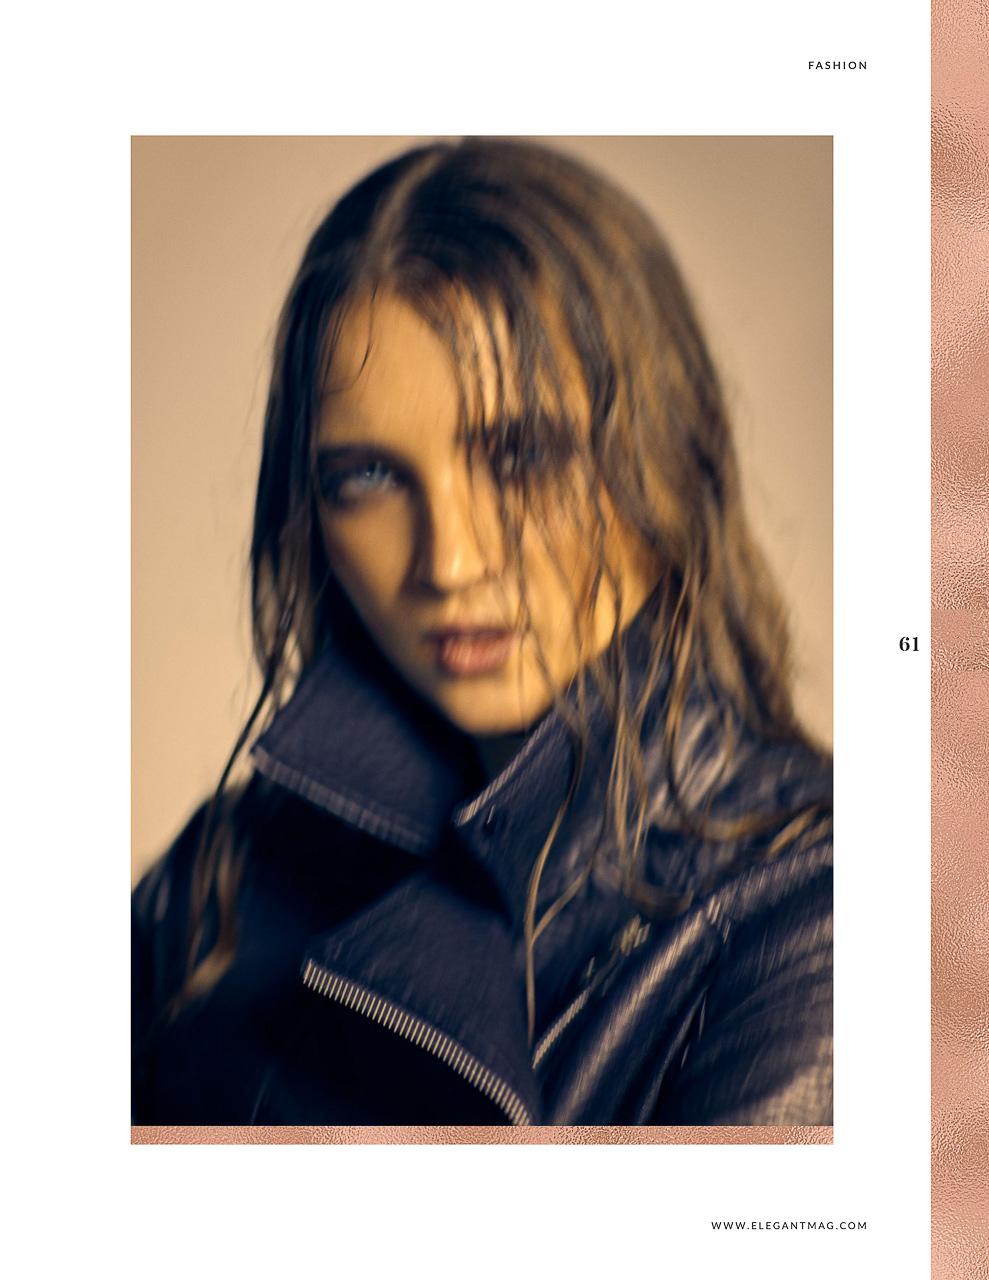 Beauty Fotoshooting München Portrait Editorial